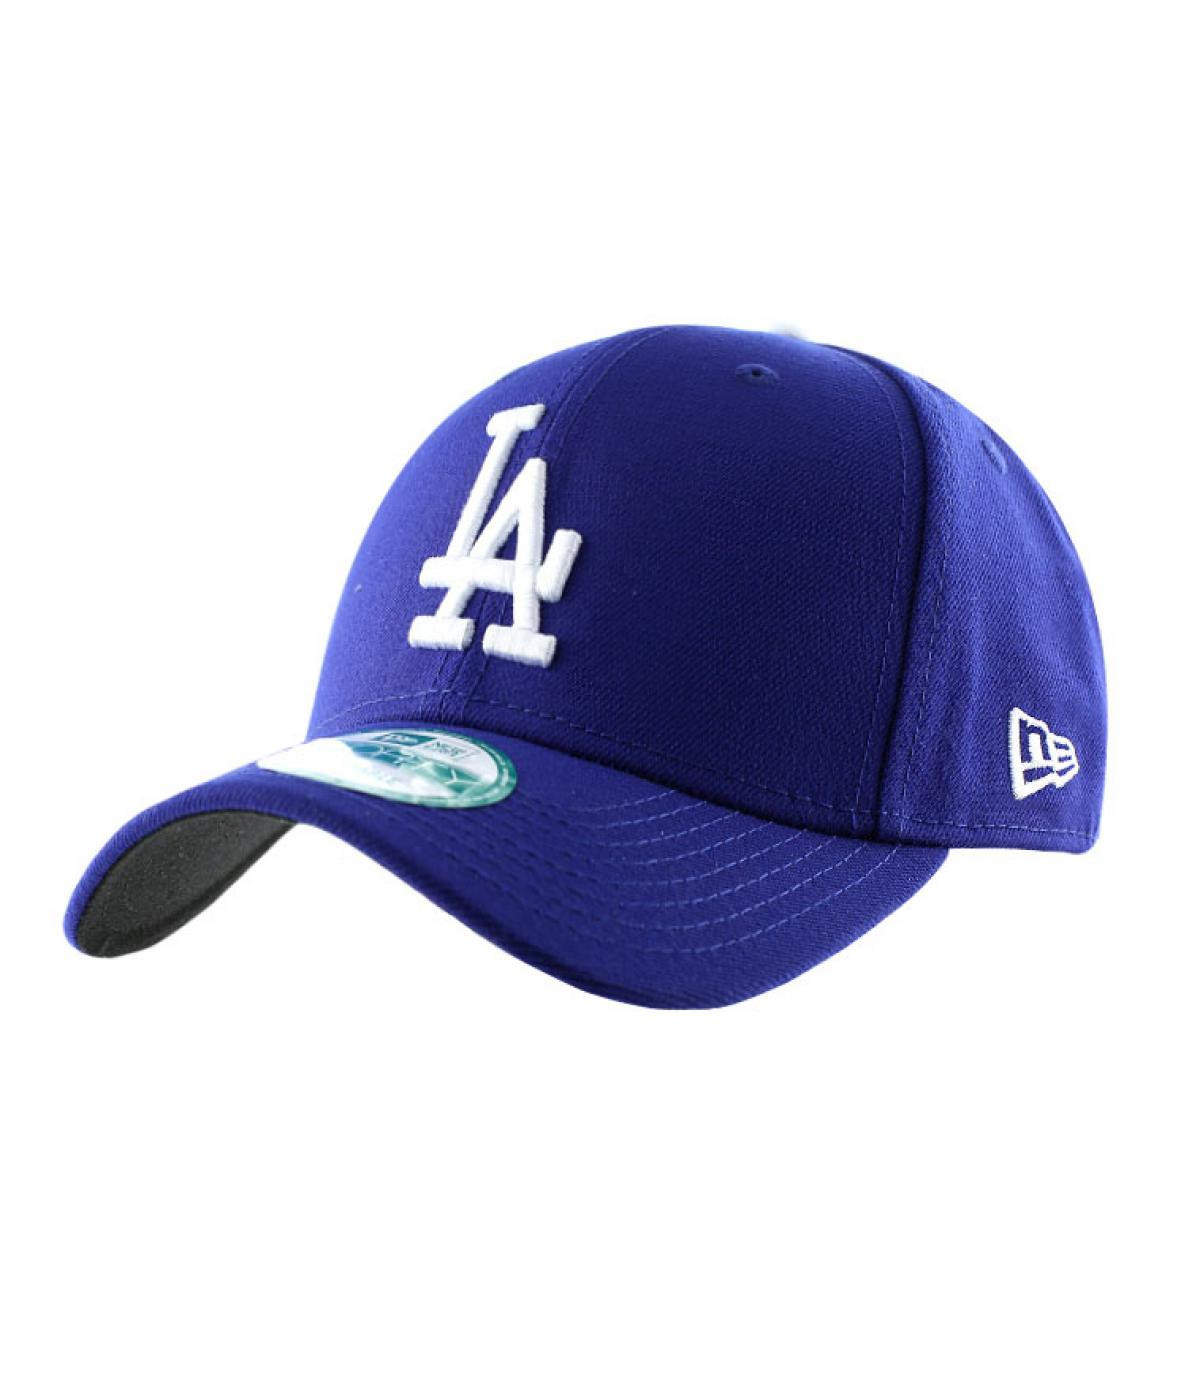 LA baseball cap - 9forty LA MLB The League by New Era. Headict 95ec2c032aa